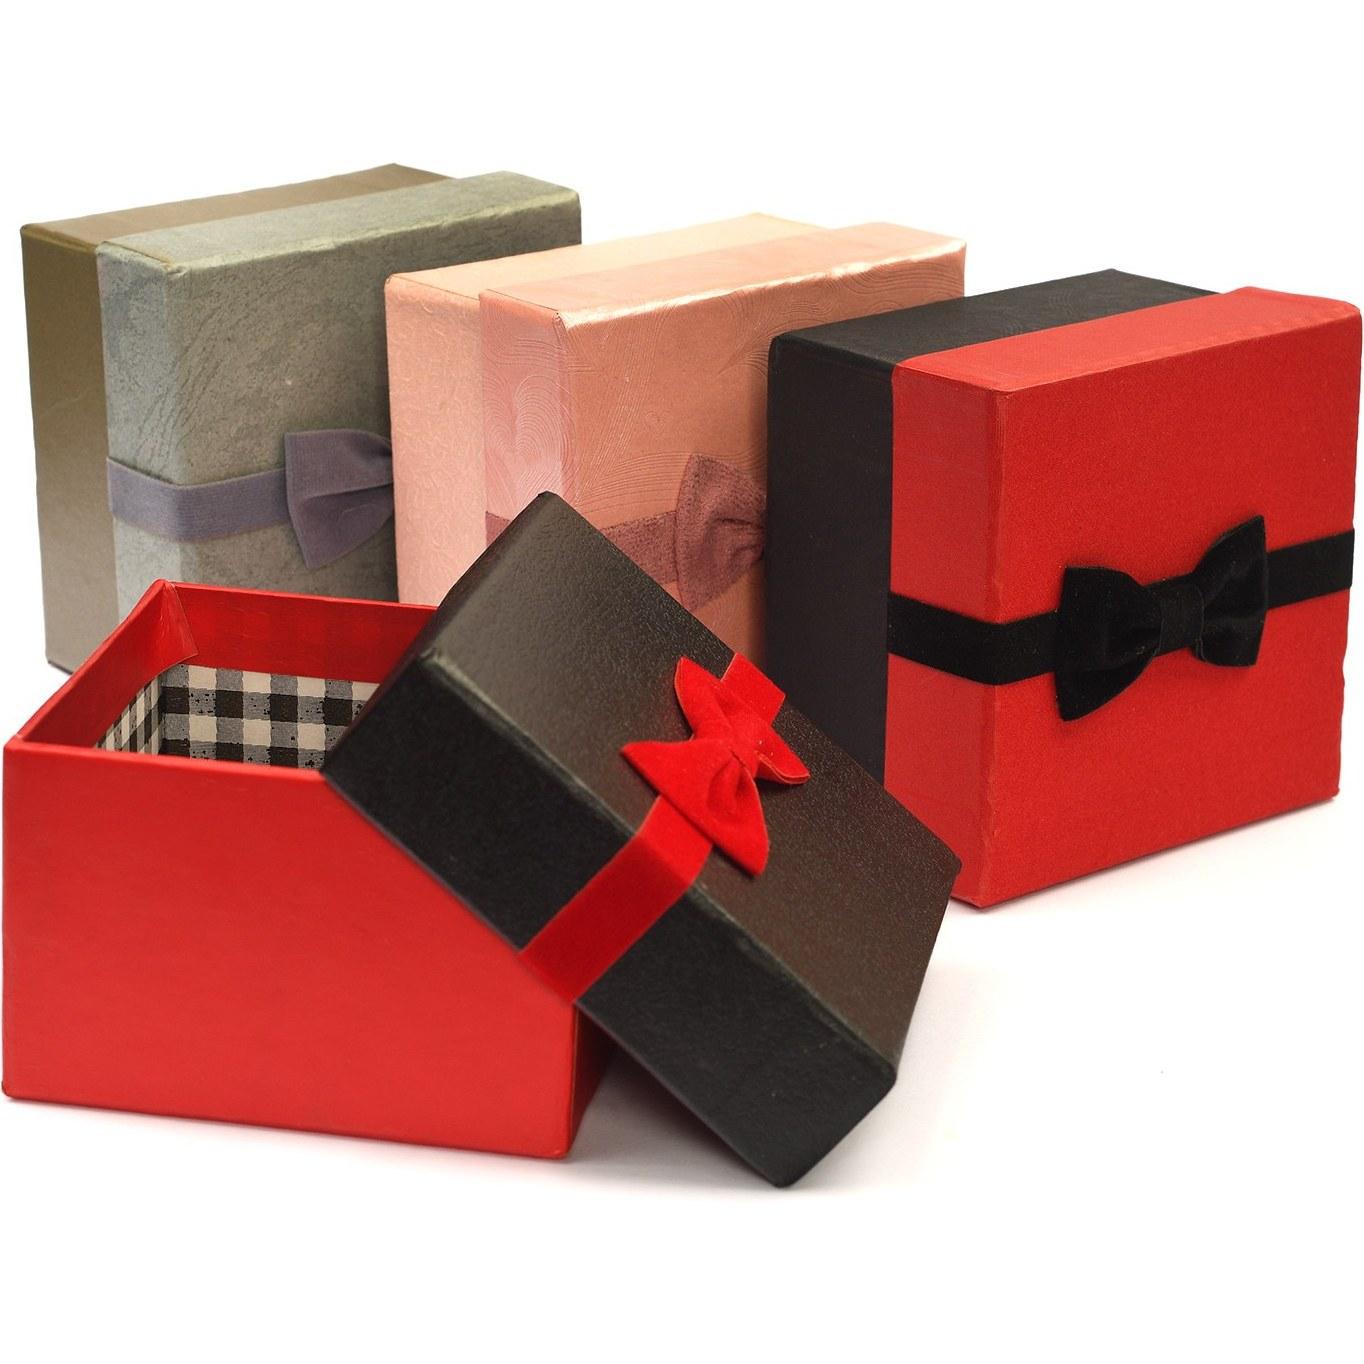 تصویر جعبه کادویی مربع کوچک